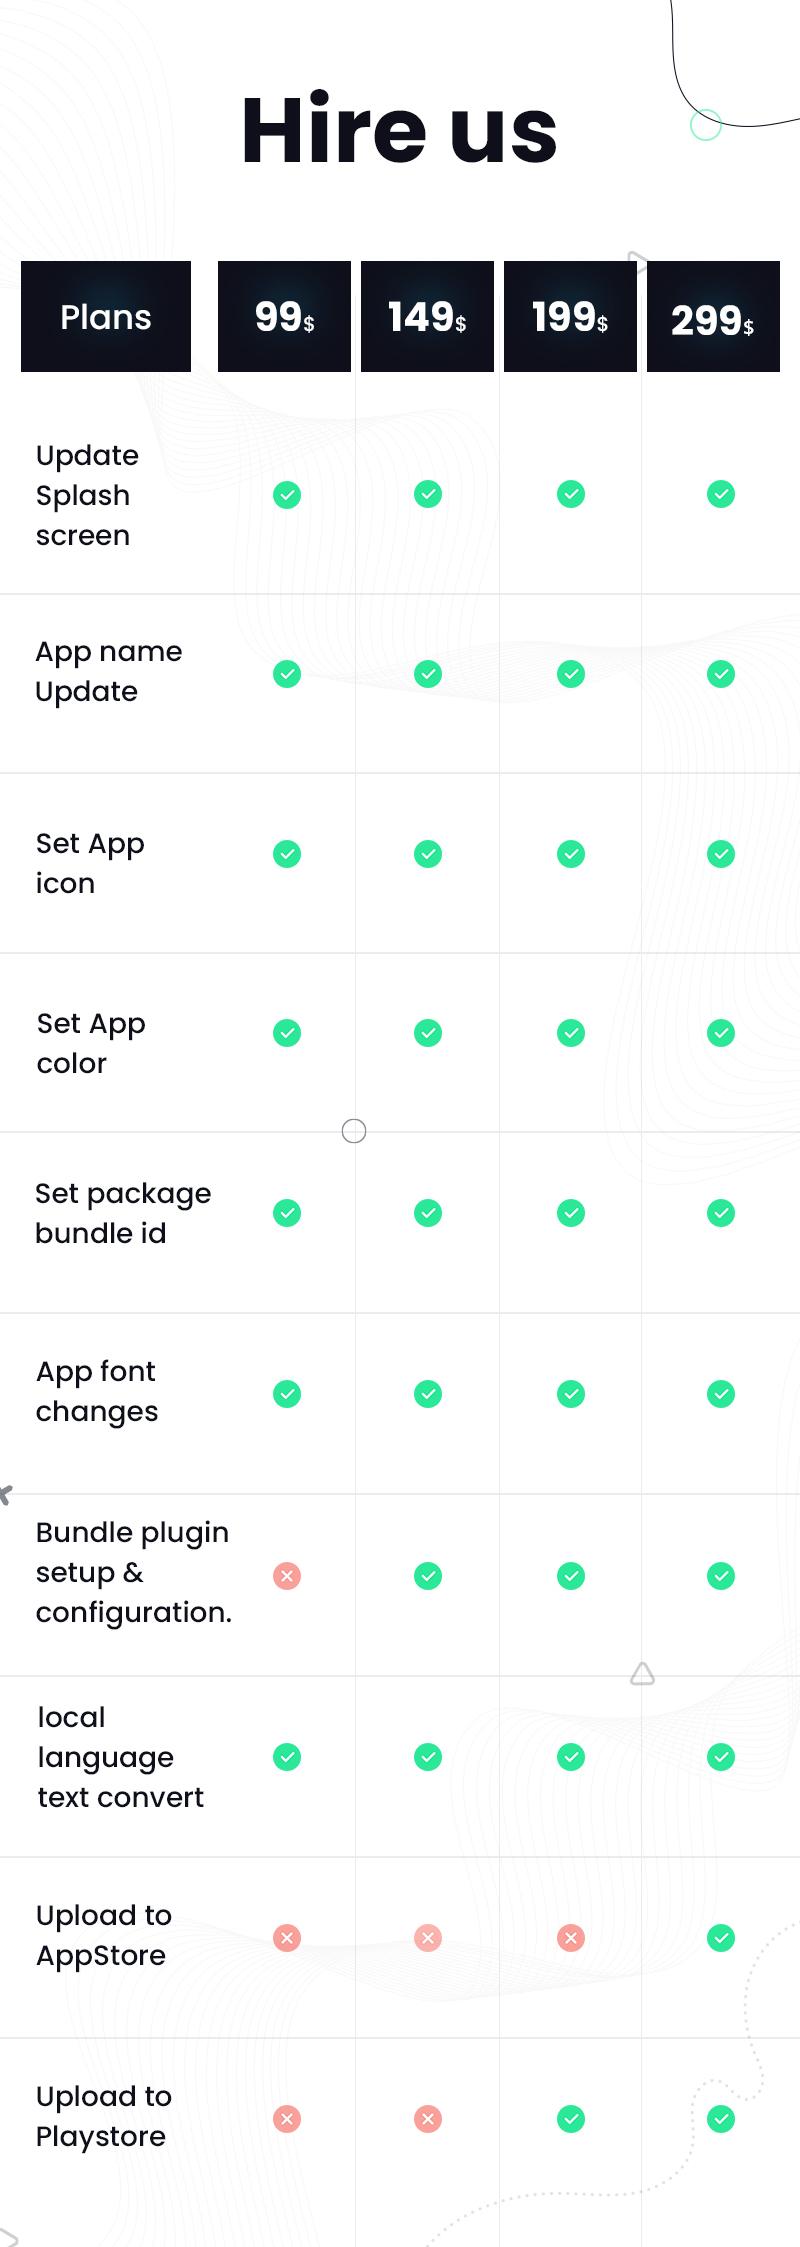 WooBox - WooCommerce iOS App  E-commerce Full Mobile App + Swift 4 - 4